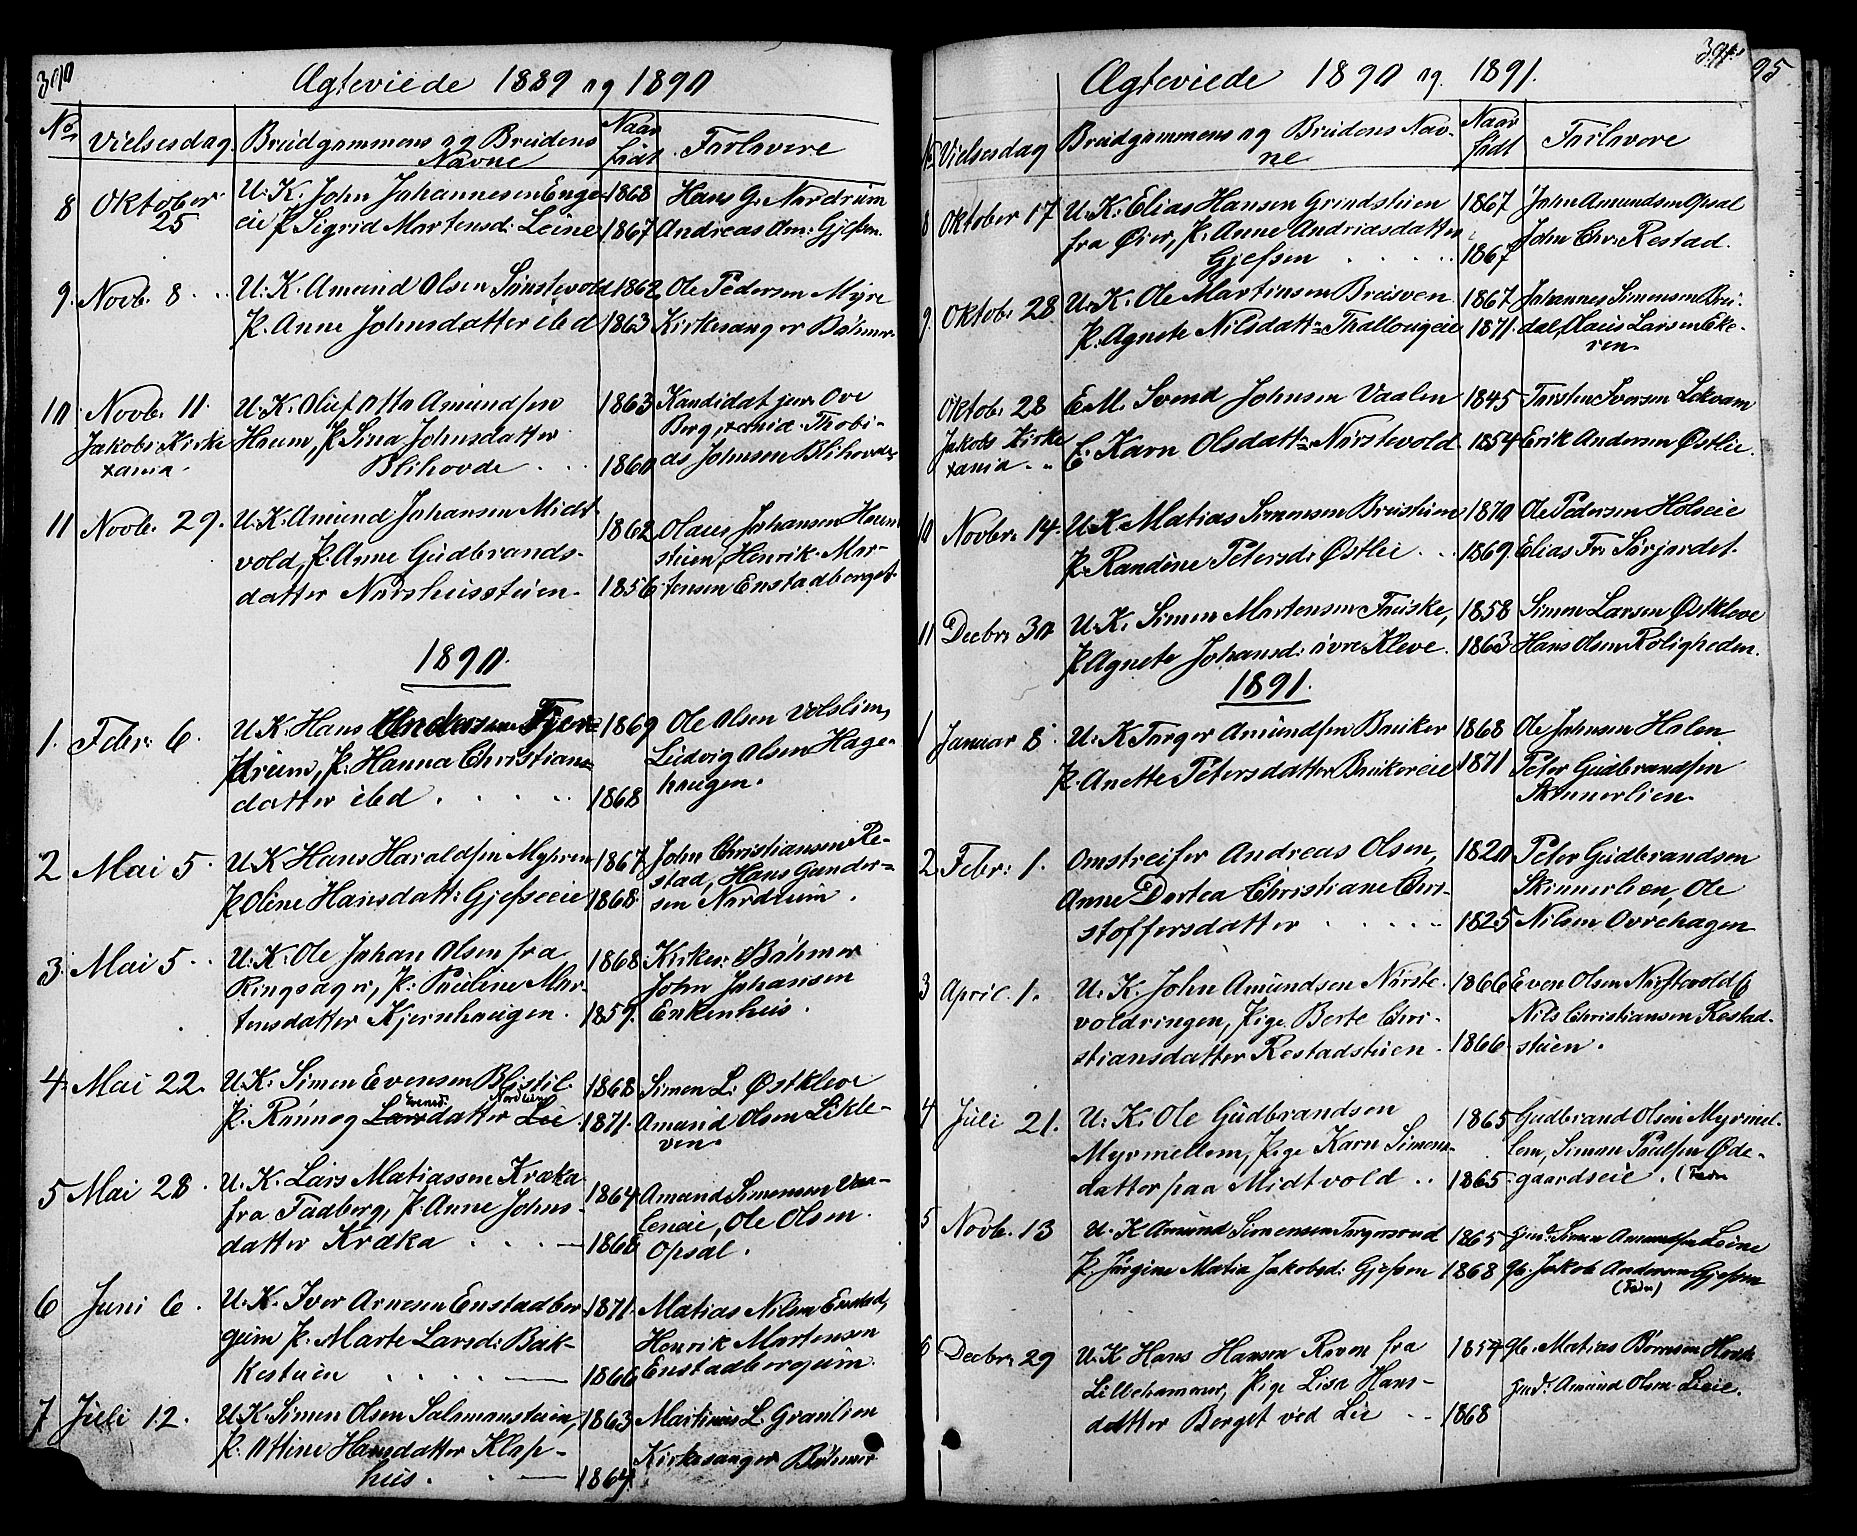 SAH, Østre Gausdal prestekontor, Klokkerbok nr. 1, 1863-1893, s. 390-391